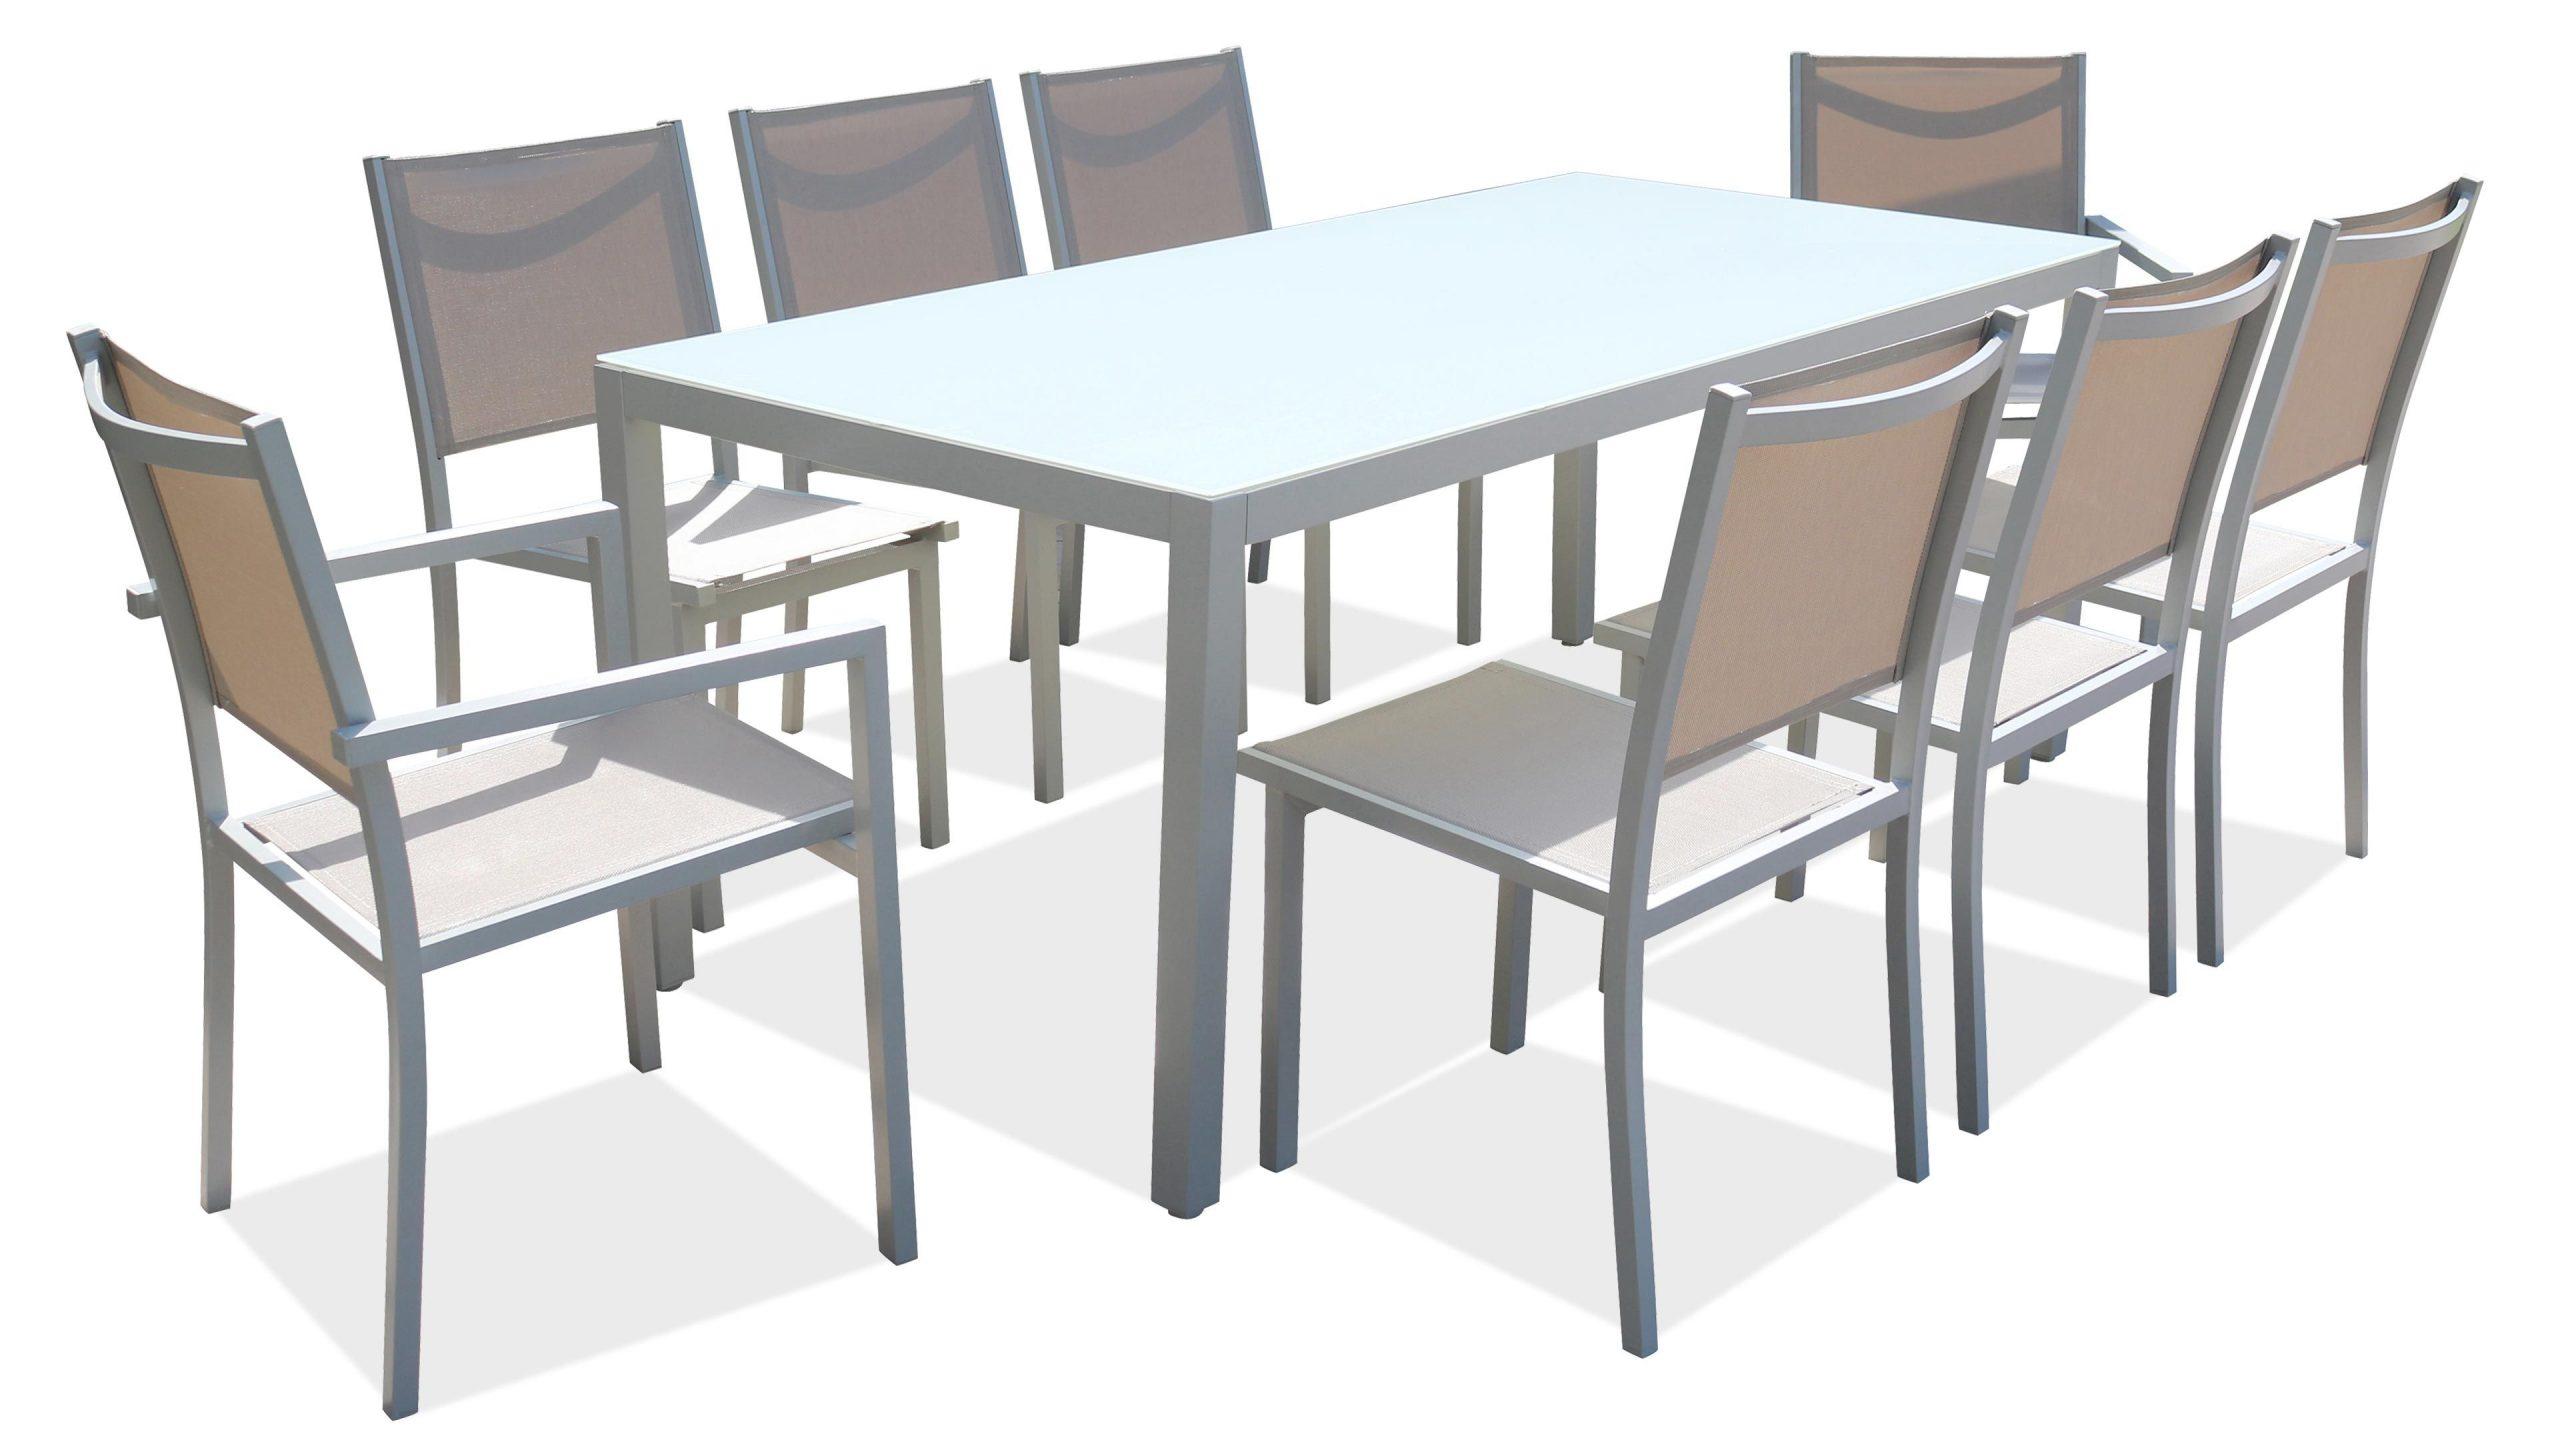 Salon De Jardin Aluminium Table De Jardin 8 Places avec Ensemble Table De Jardin Promotion